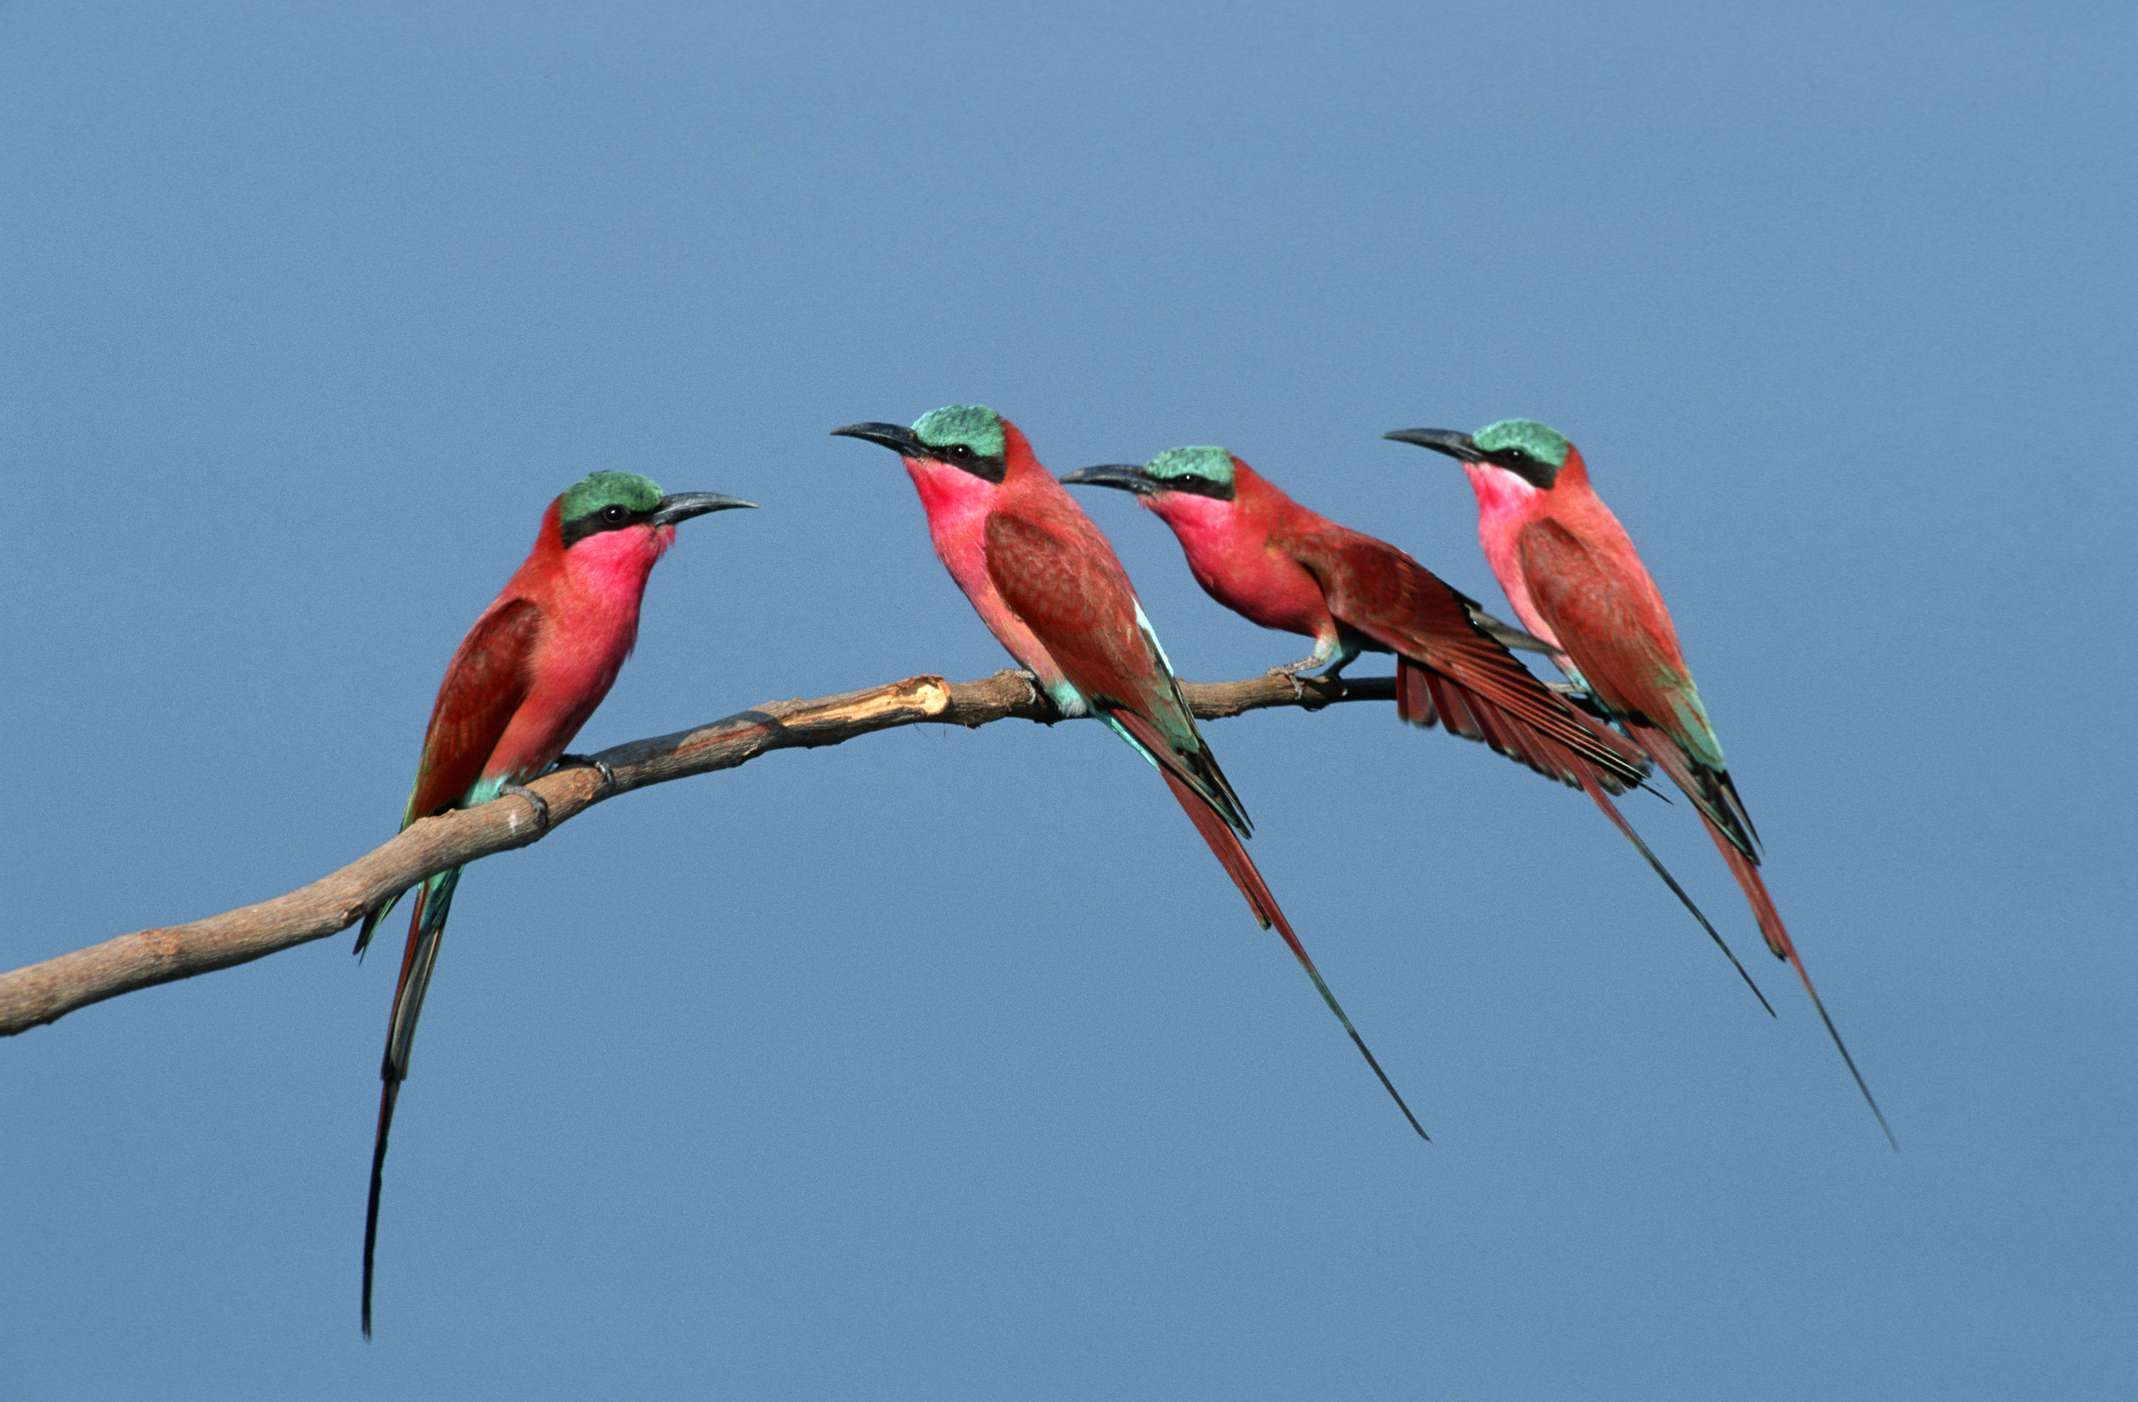 Carmine Bee-Eaters, Southern Africa Best Birding